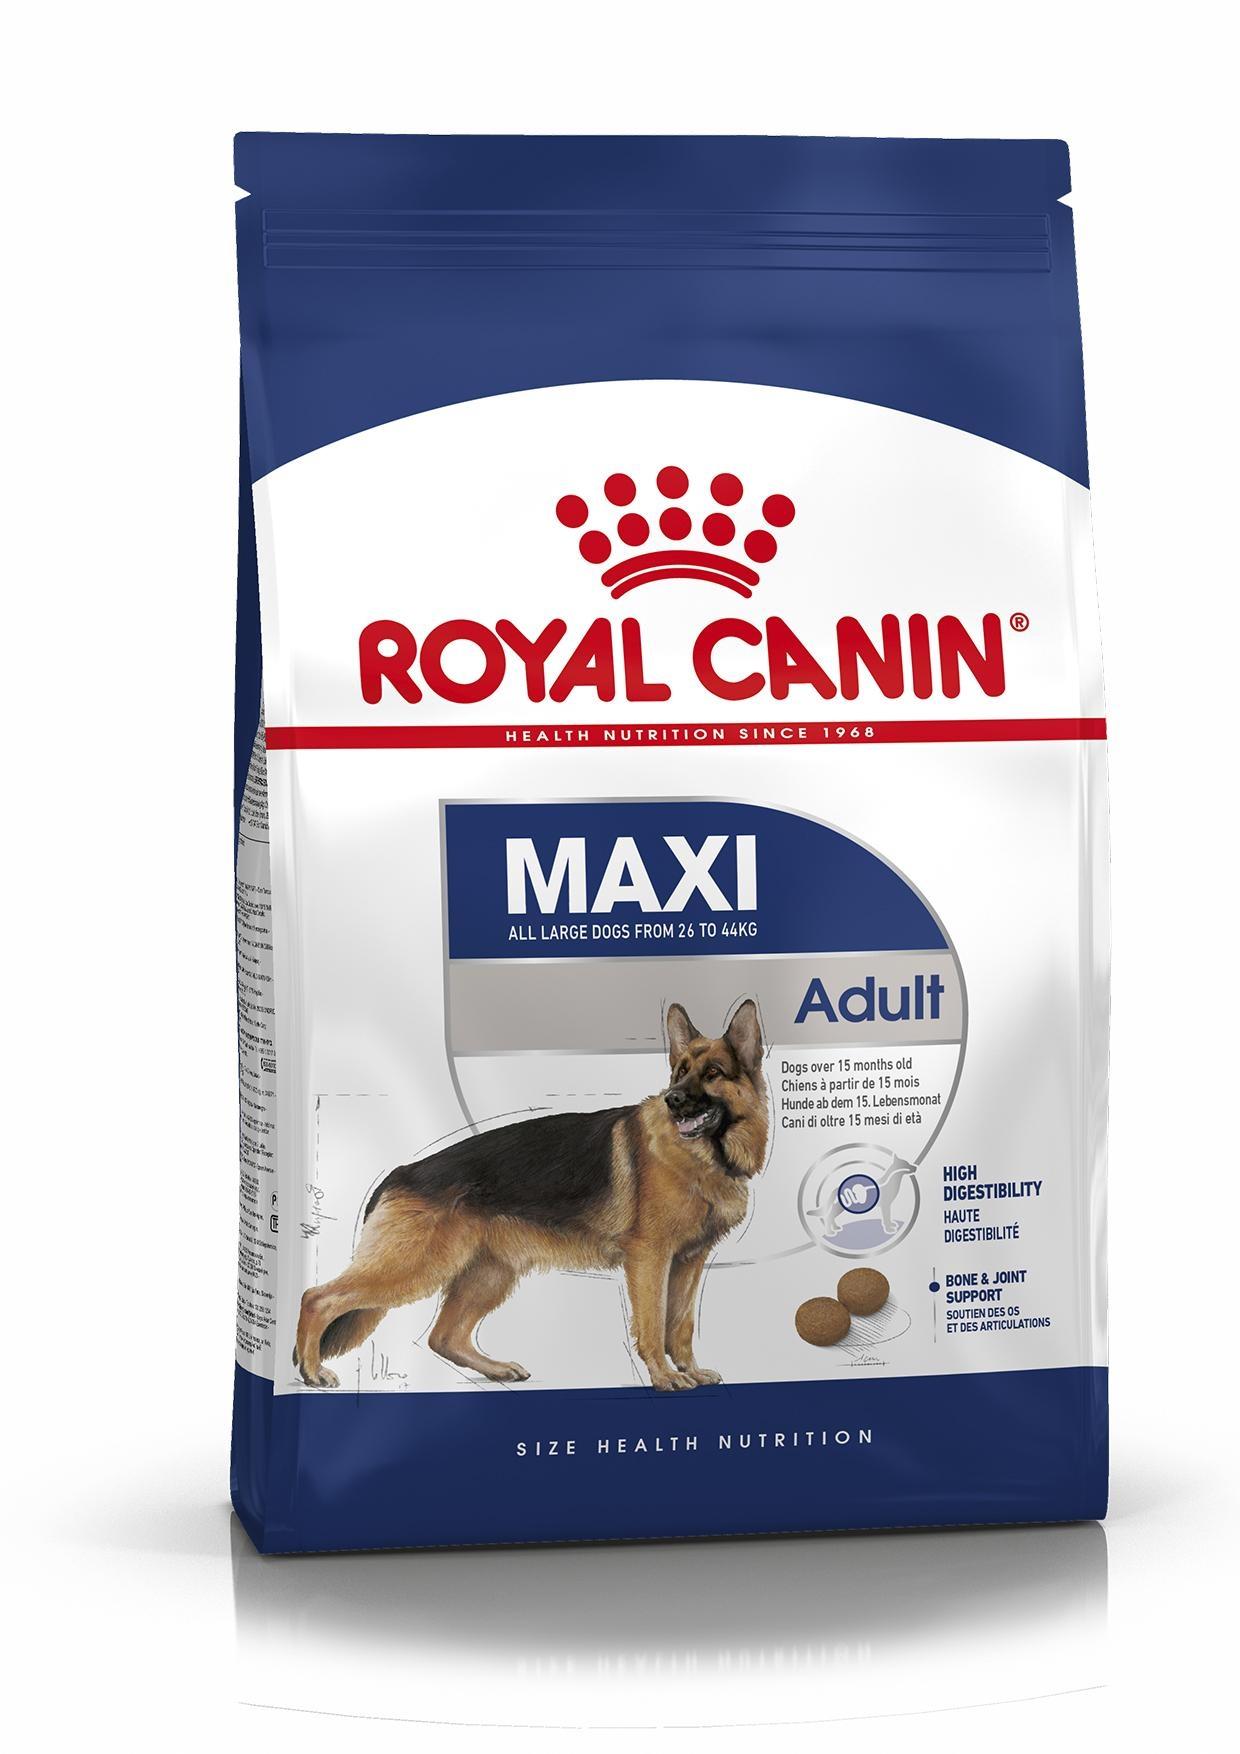 Royal Canin Maxi Adult 4 kg